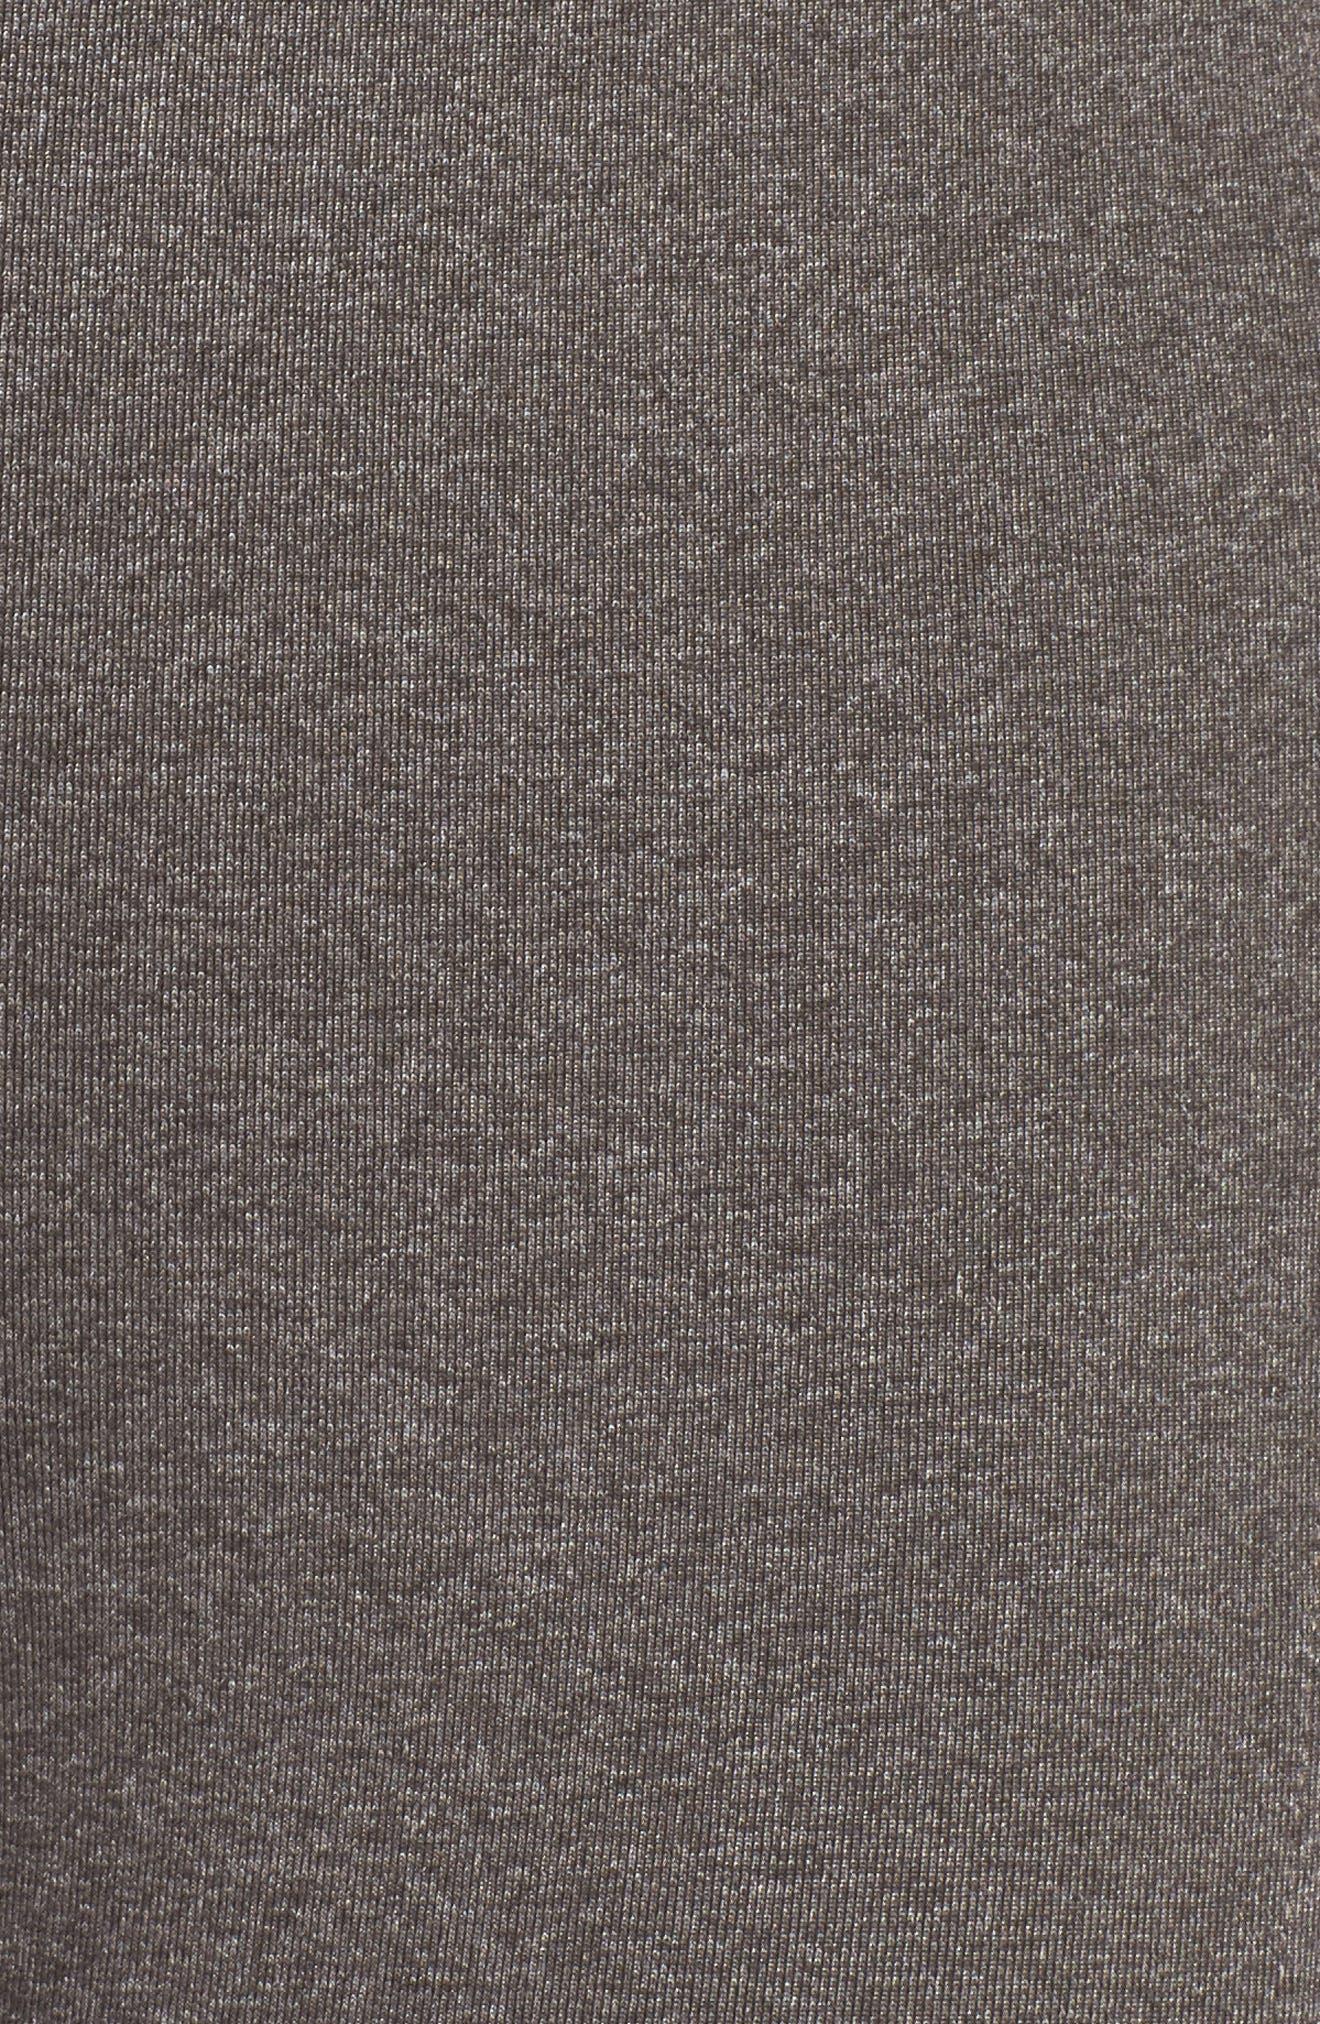 FP Movement Dreamweaver Leggings,                             Alternate thumbnail 6, color,                             Grey